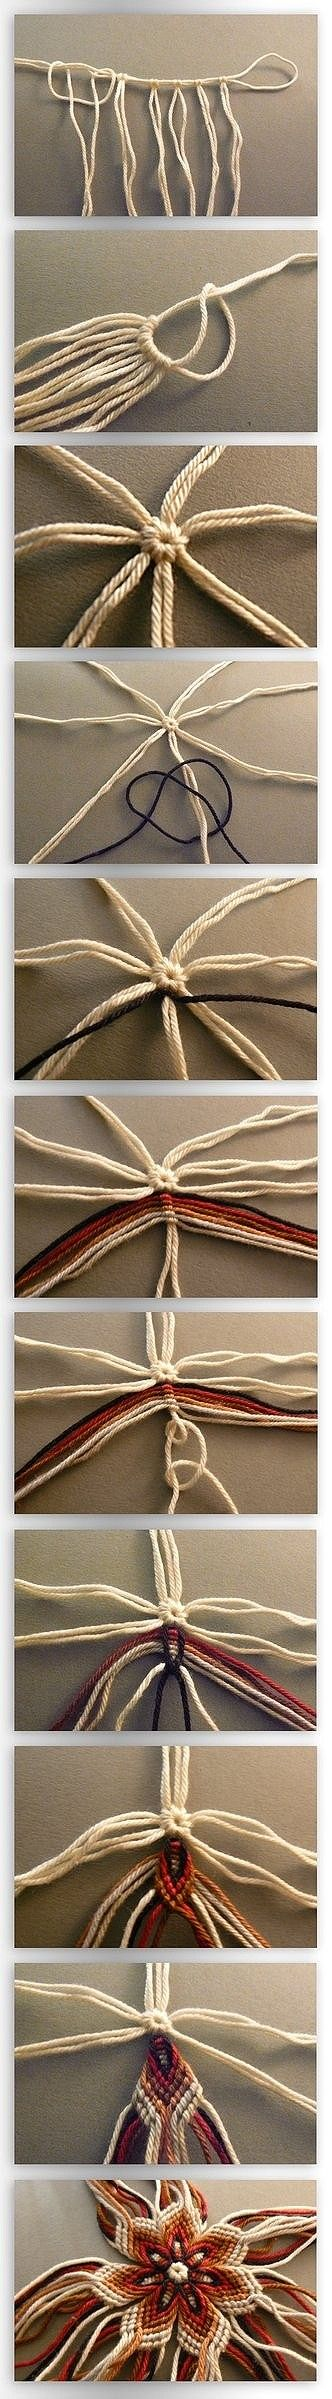 Friendship Bracelets Flower